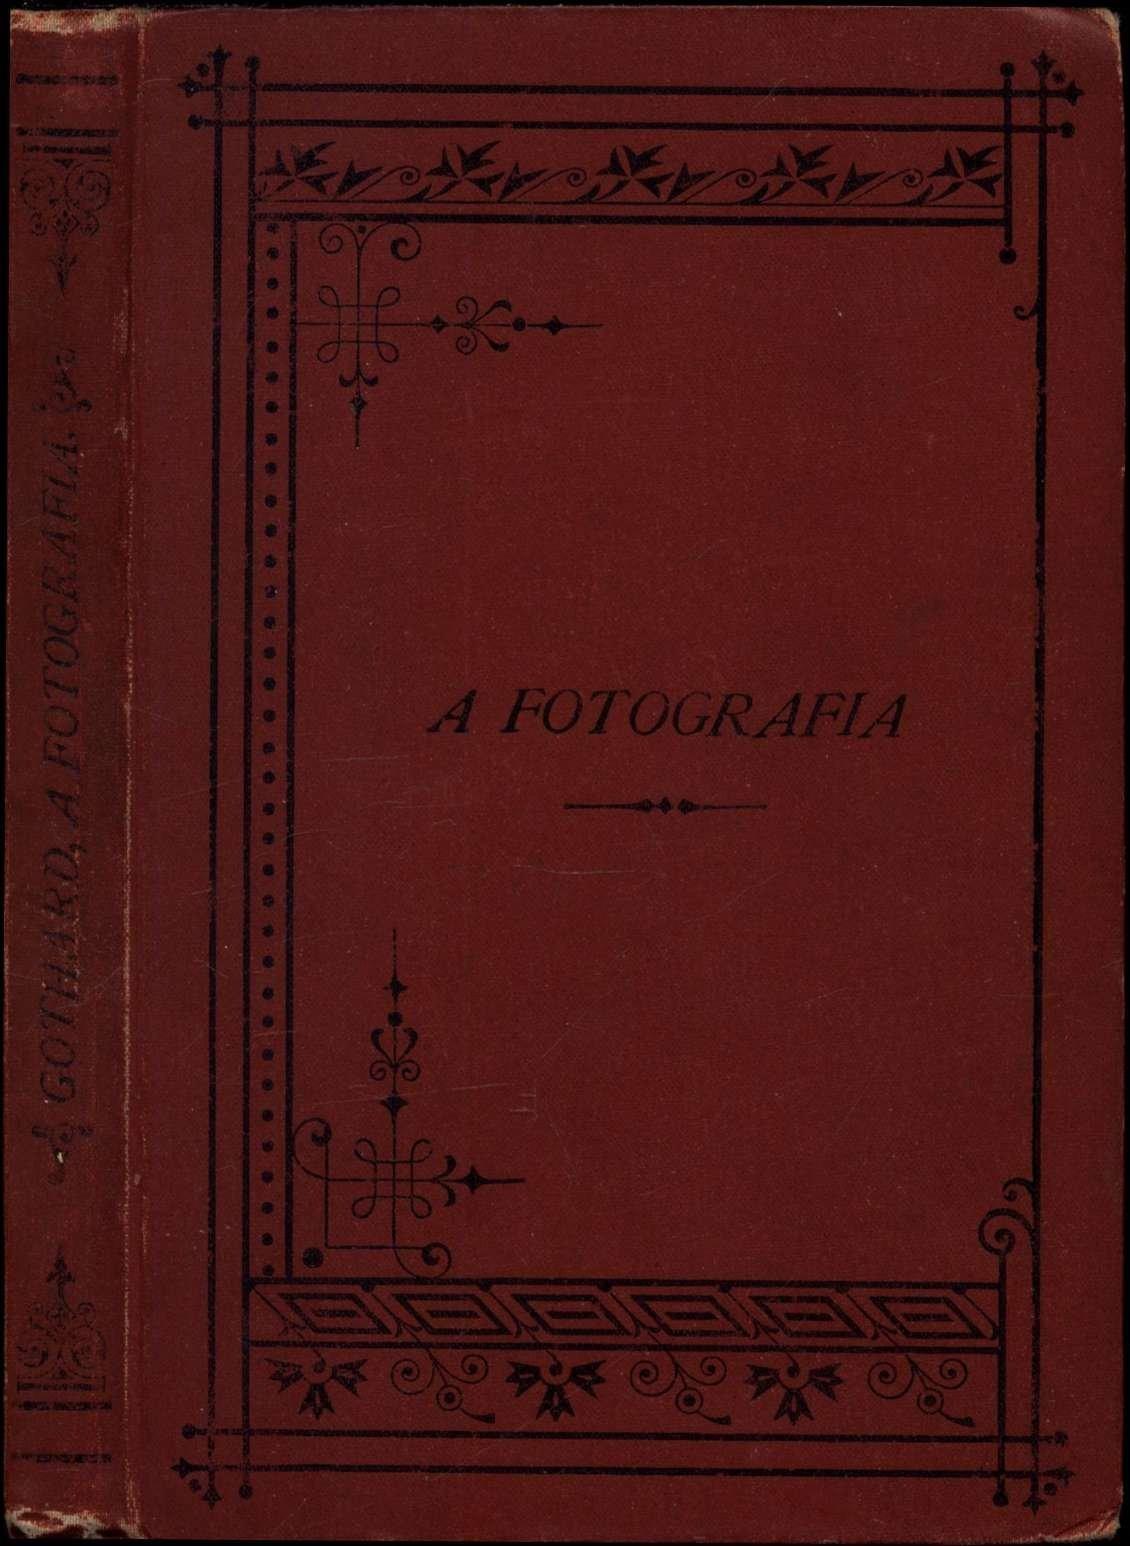 10_gothard_jeno_a_fotografia_1890.jpg